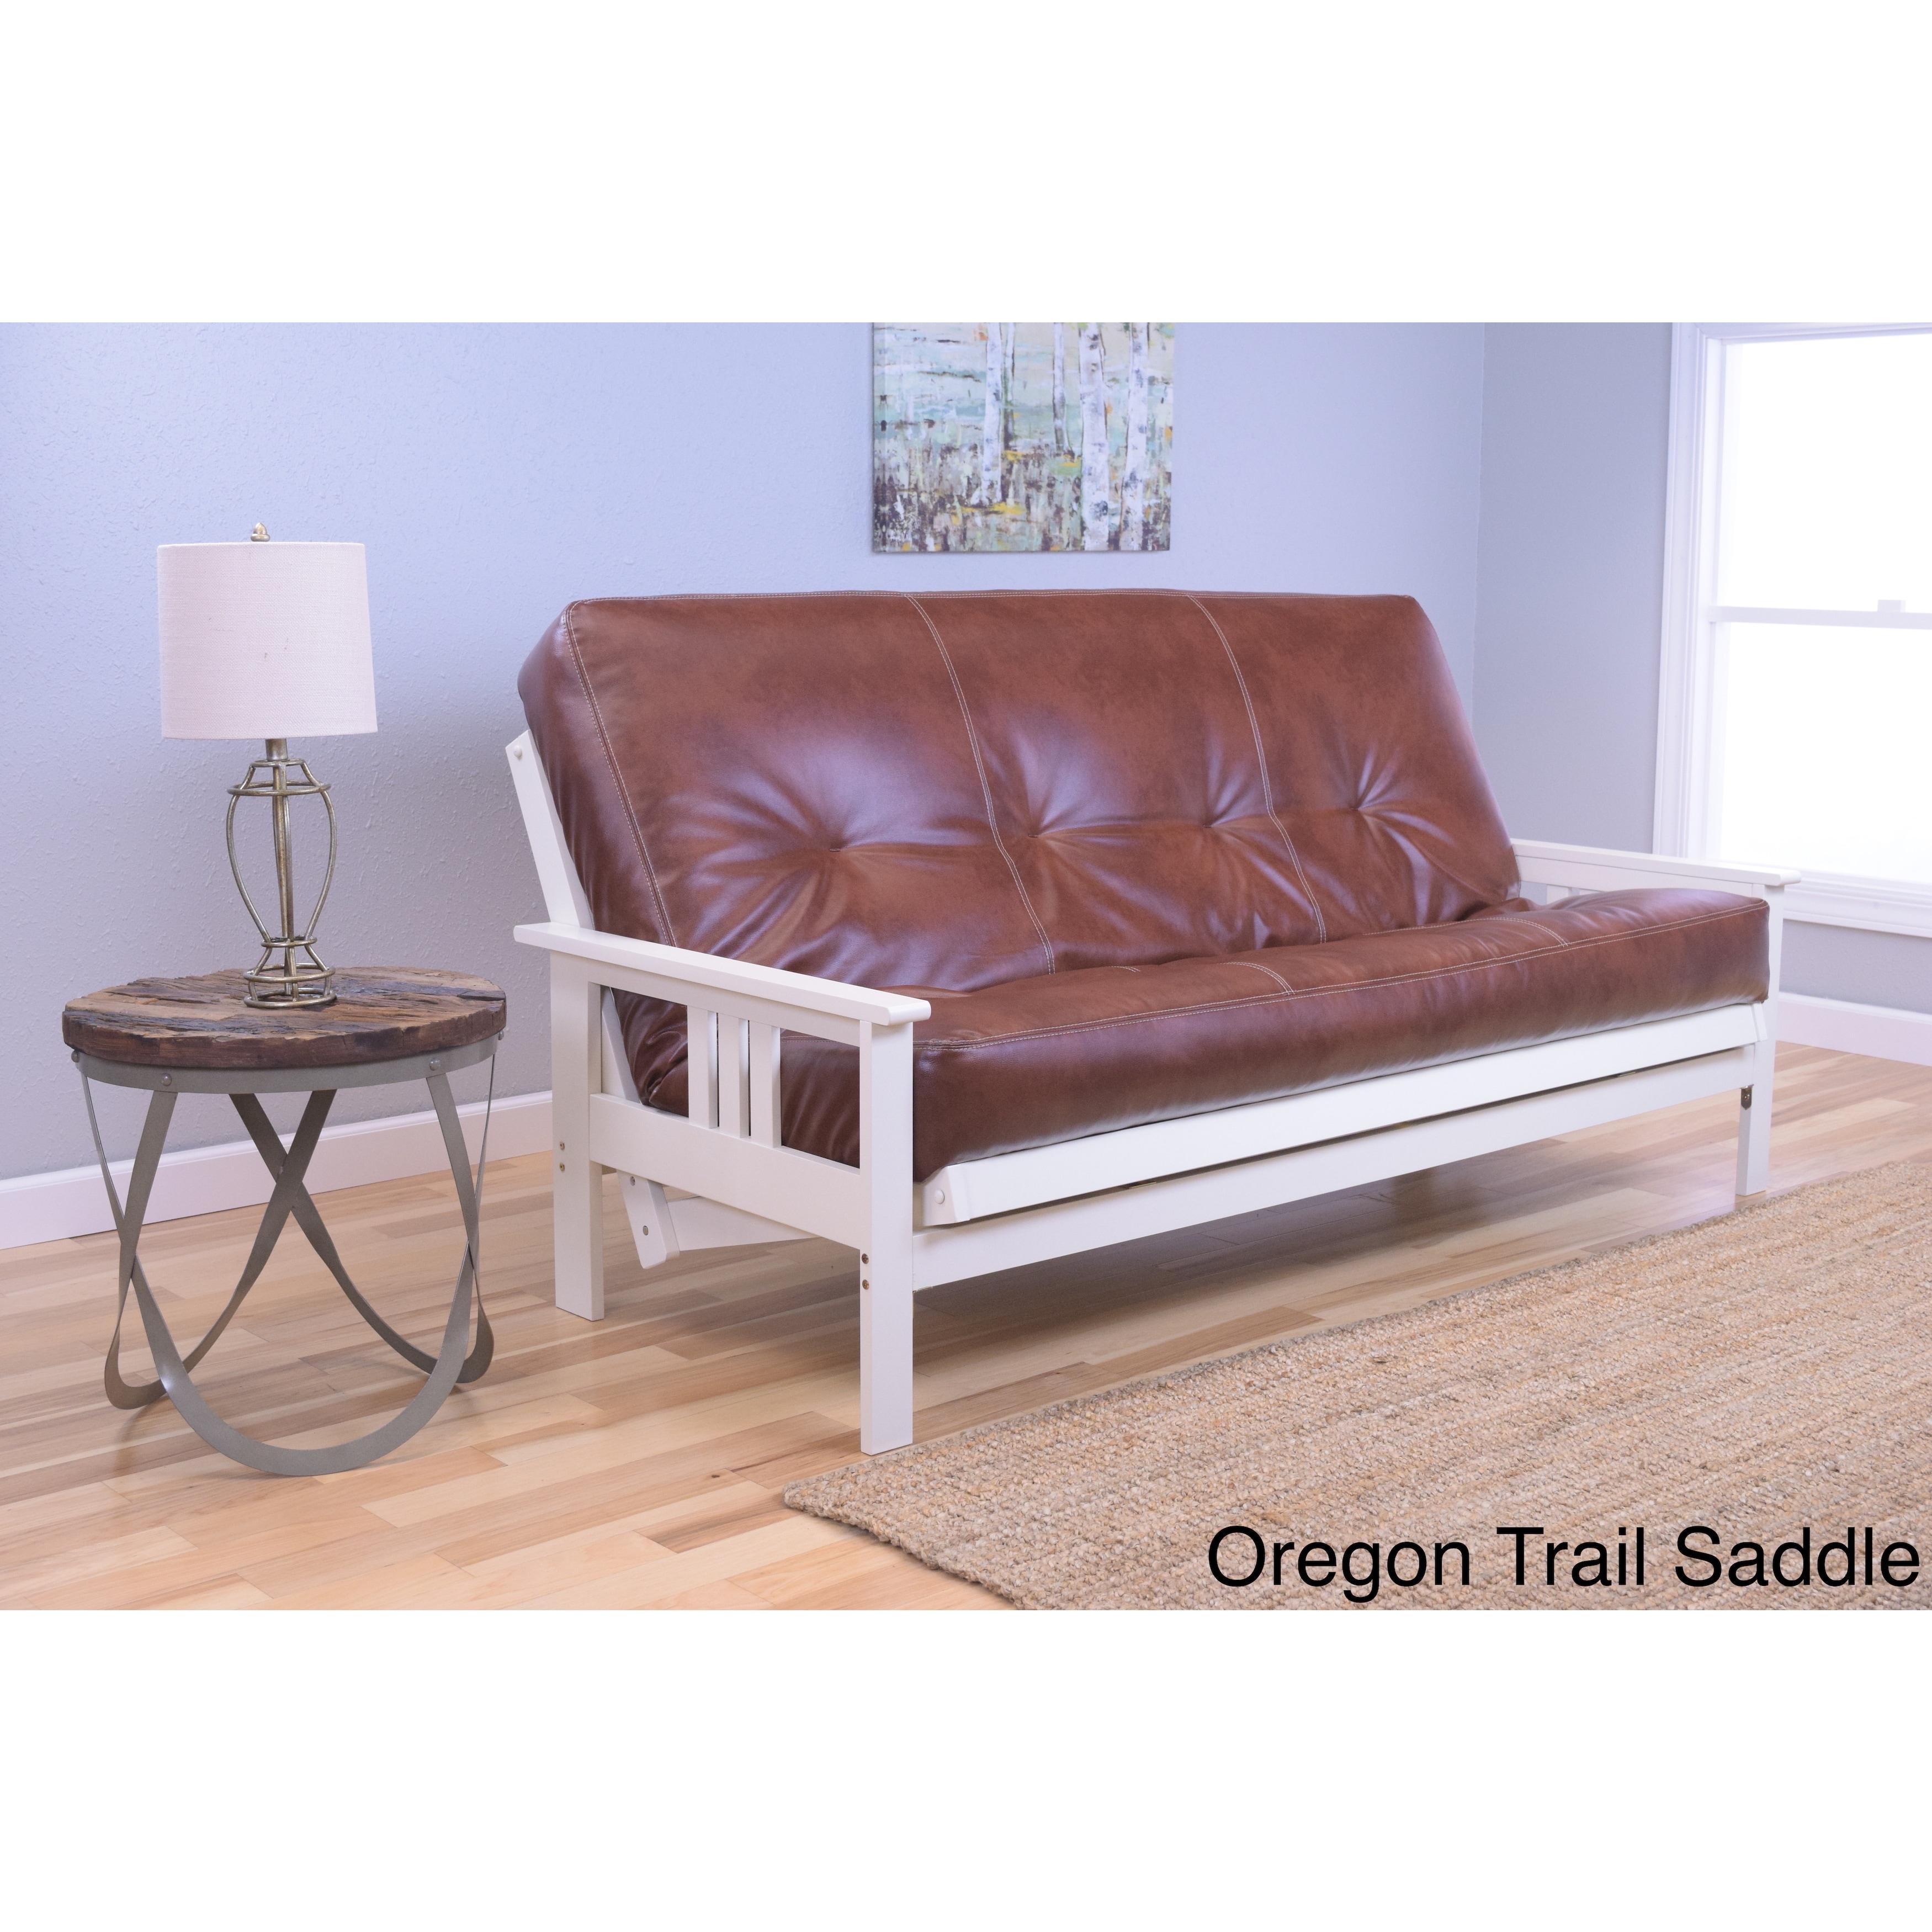 Somette Beli Mont Beige/Brown Fabric/Wood Futon (Oregon T...